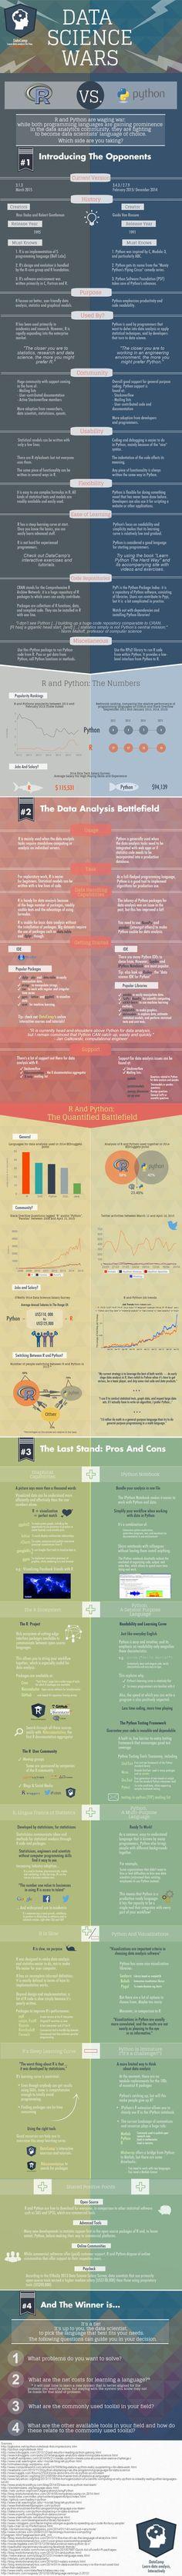 Choosing R or Python for data analysis? An infographic https://www.datacamp.com/community/tutorials/r-or-python-for-data-analysis